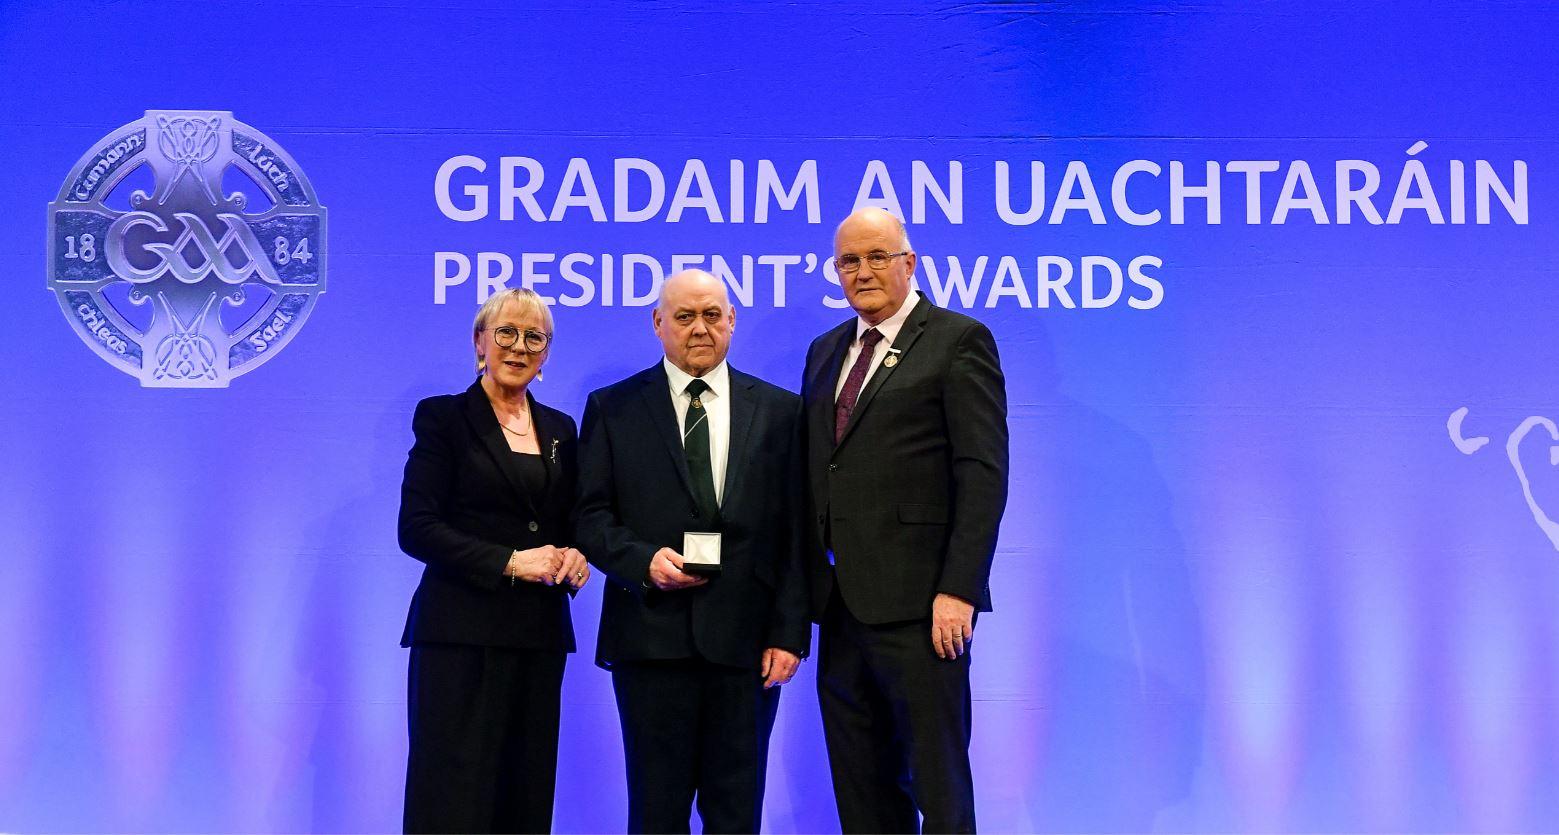 Ulster winners at Gradaim an Uachtaráin 2020